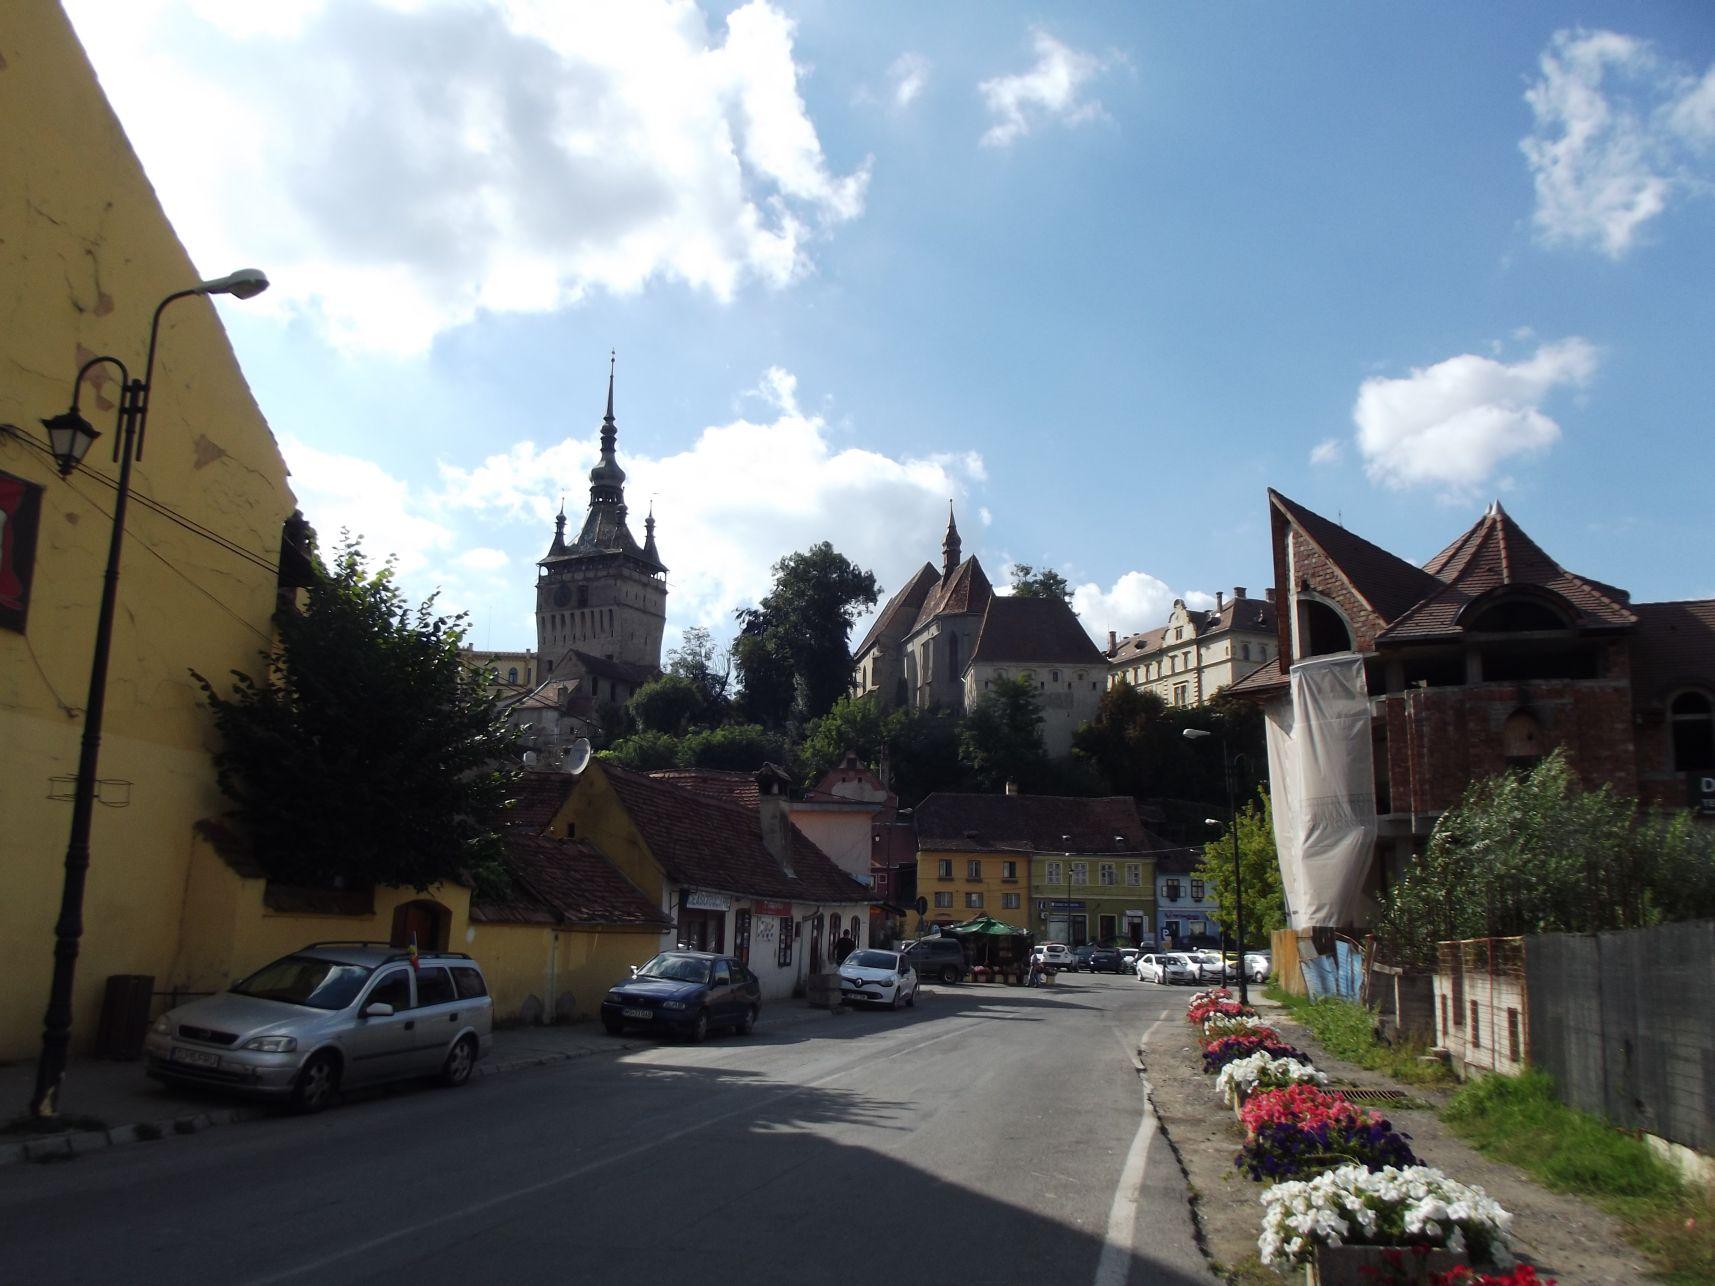 Óratorony, Kolostor templom, Kovácsok tornya